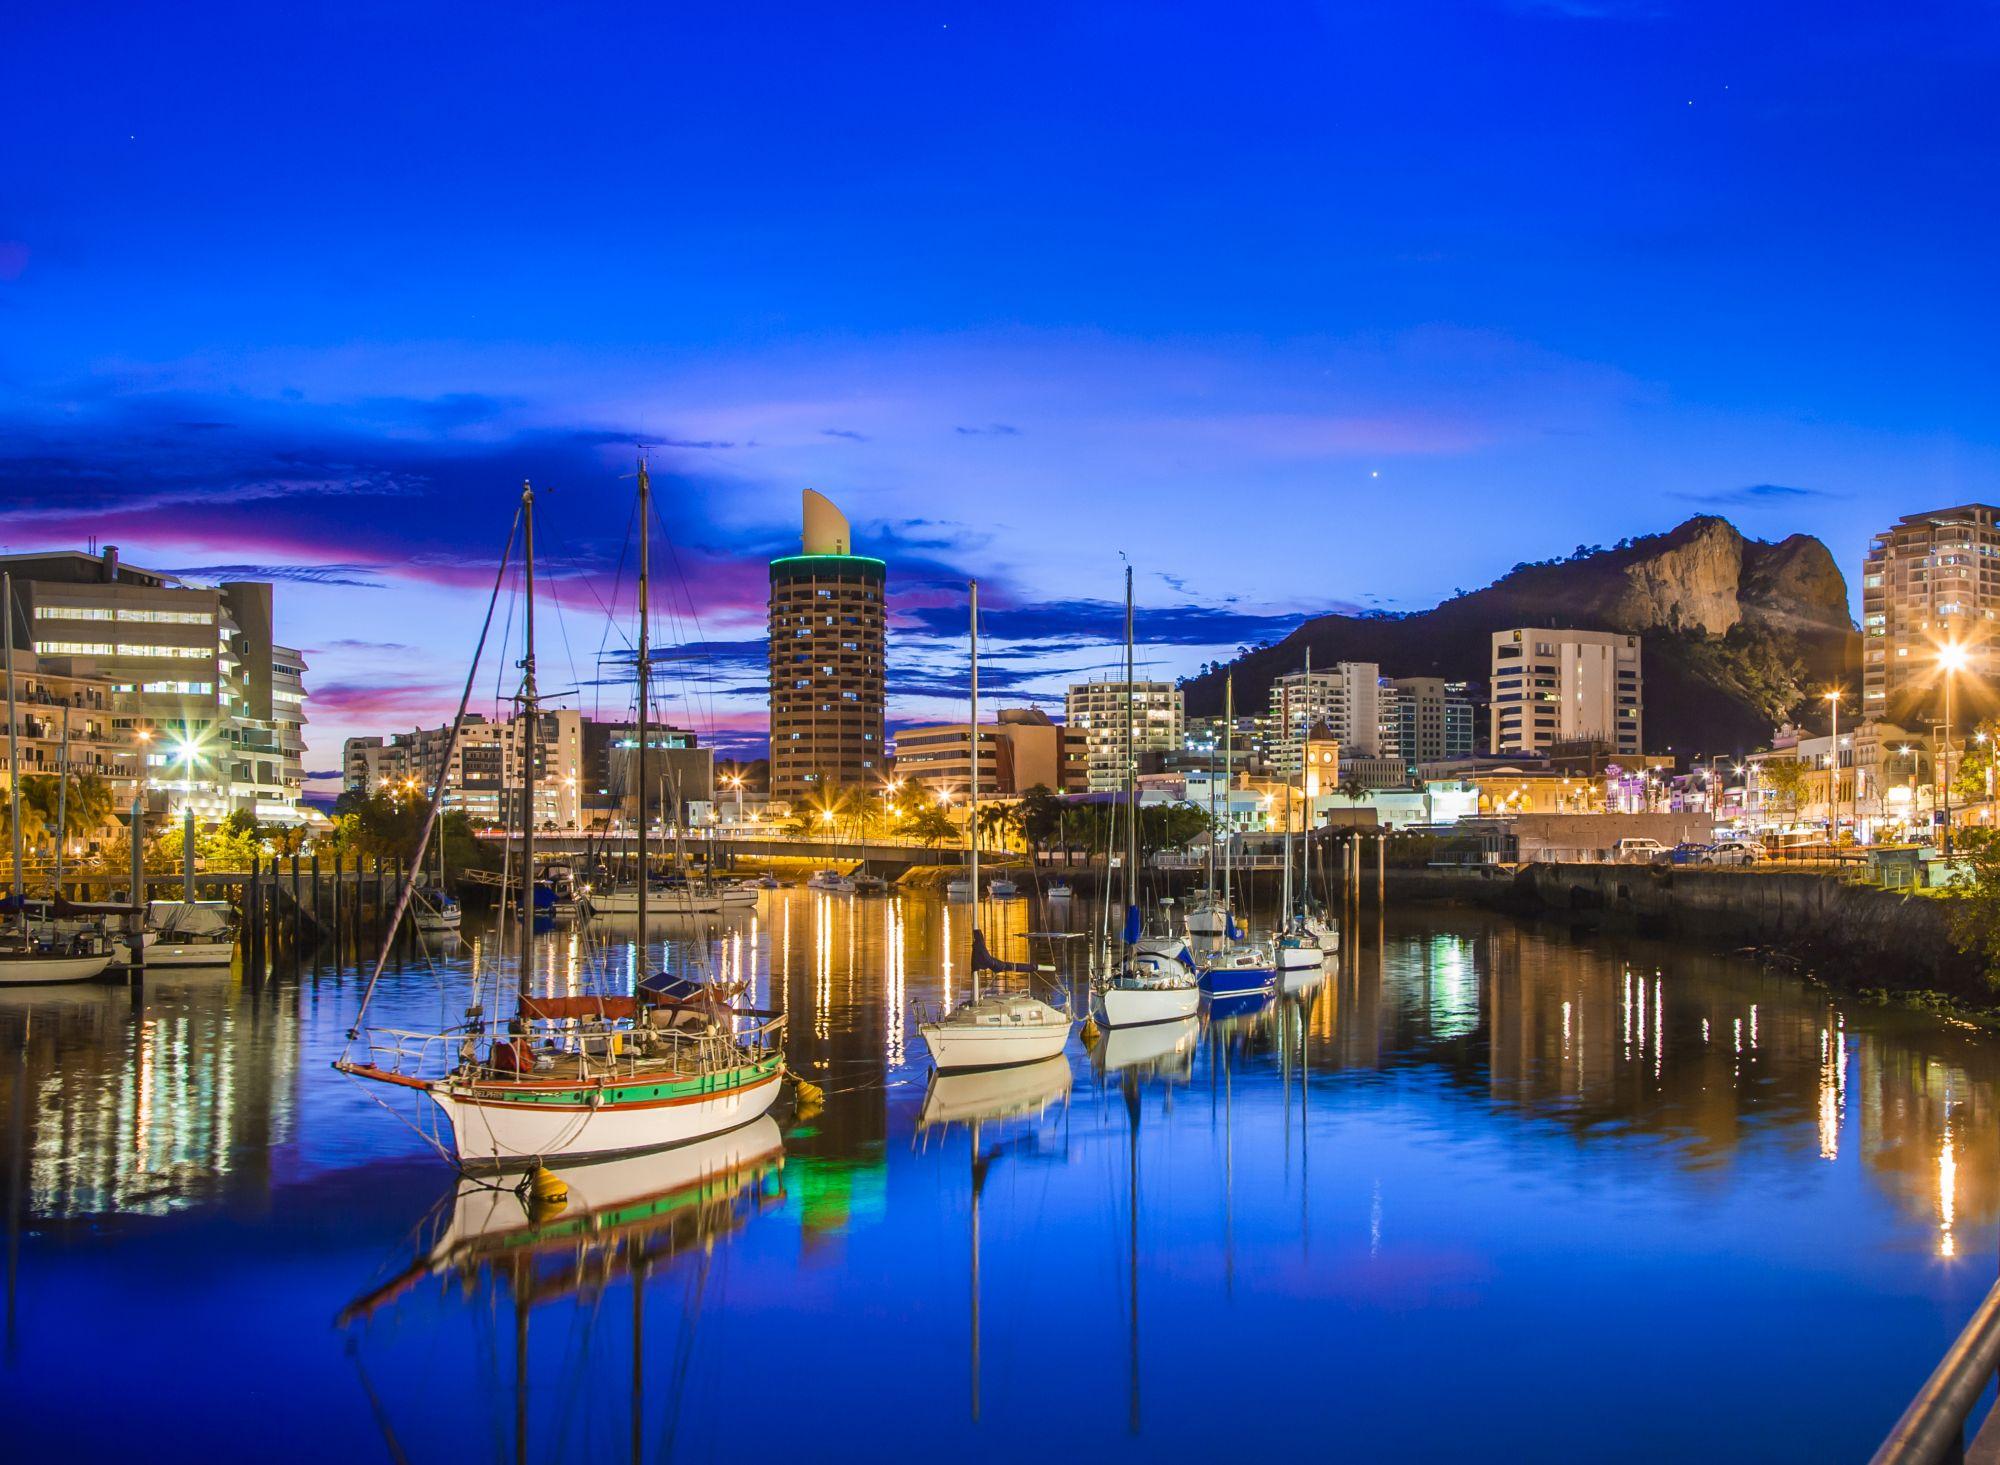 Hotel Grand Chancellor Townsville Venue Hire Enquire Today